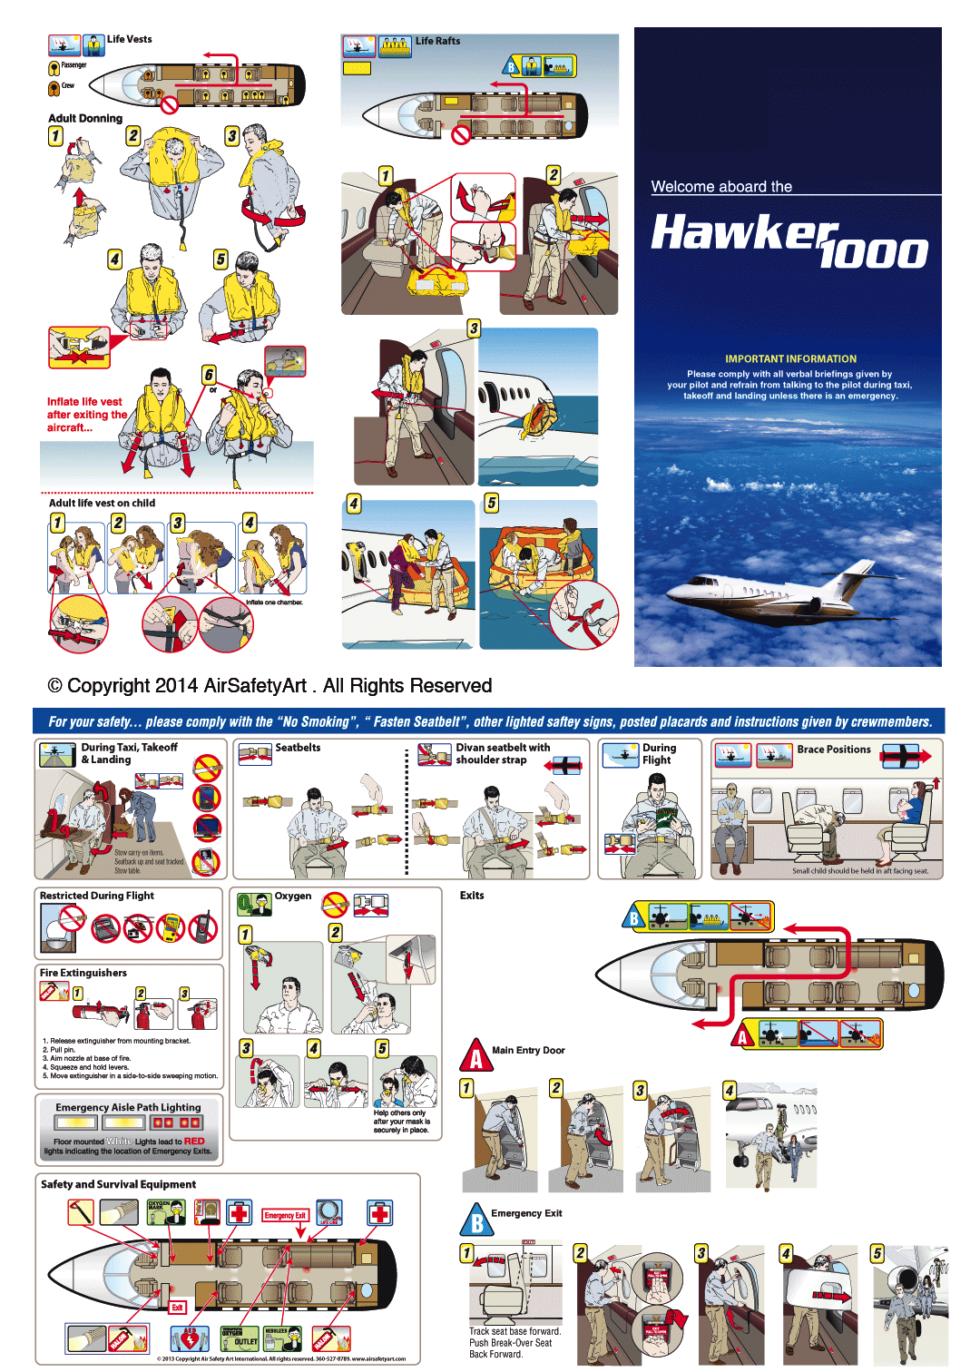 Hawker 1000 Safety Briefing Card Air Safety Art